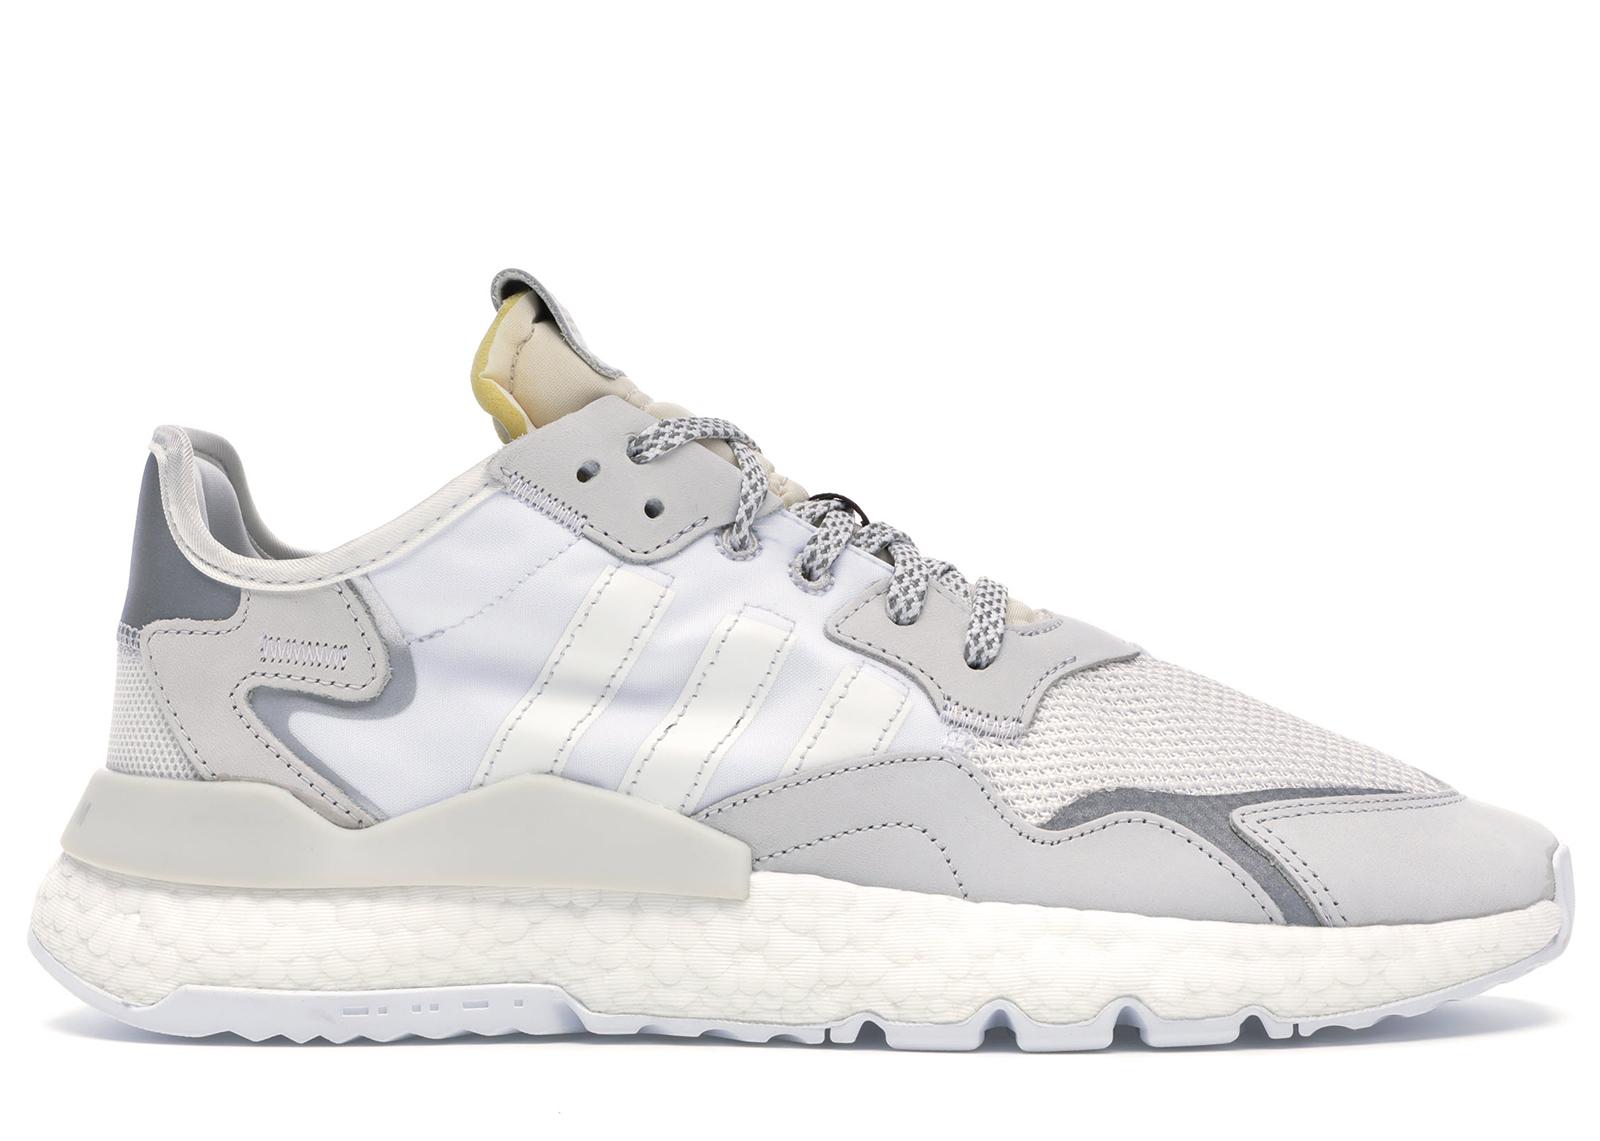 adidas Nite Jogger 3M White - EE5855